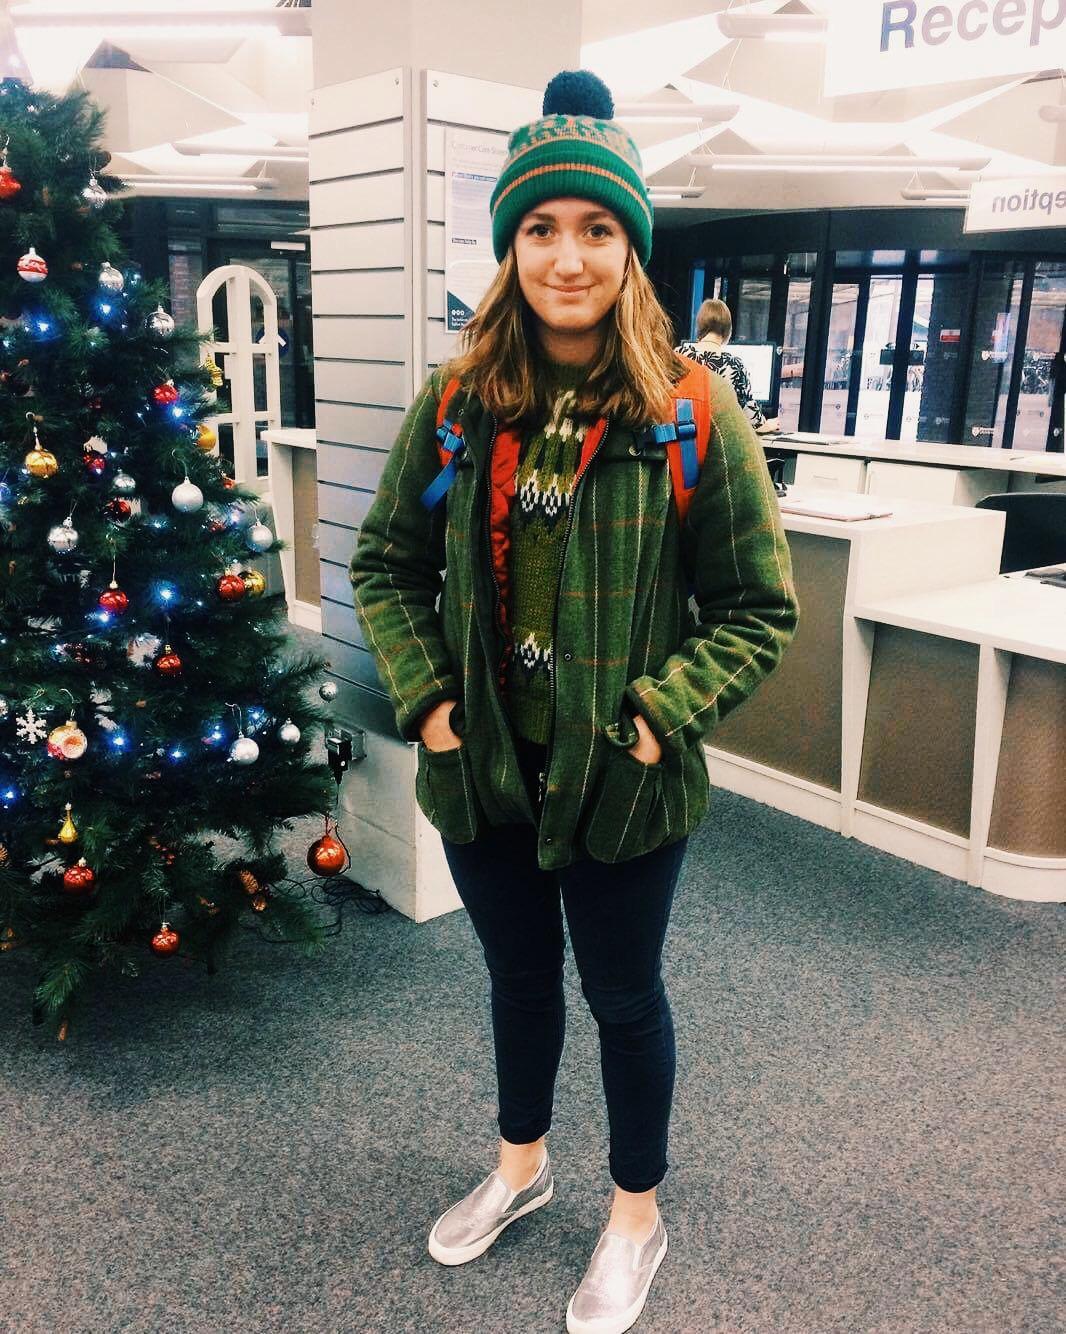 Jess Hepburn  Jacket: Retro Newcastle Knitted jumper: Topshop  Hat: Rab